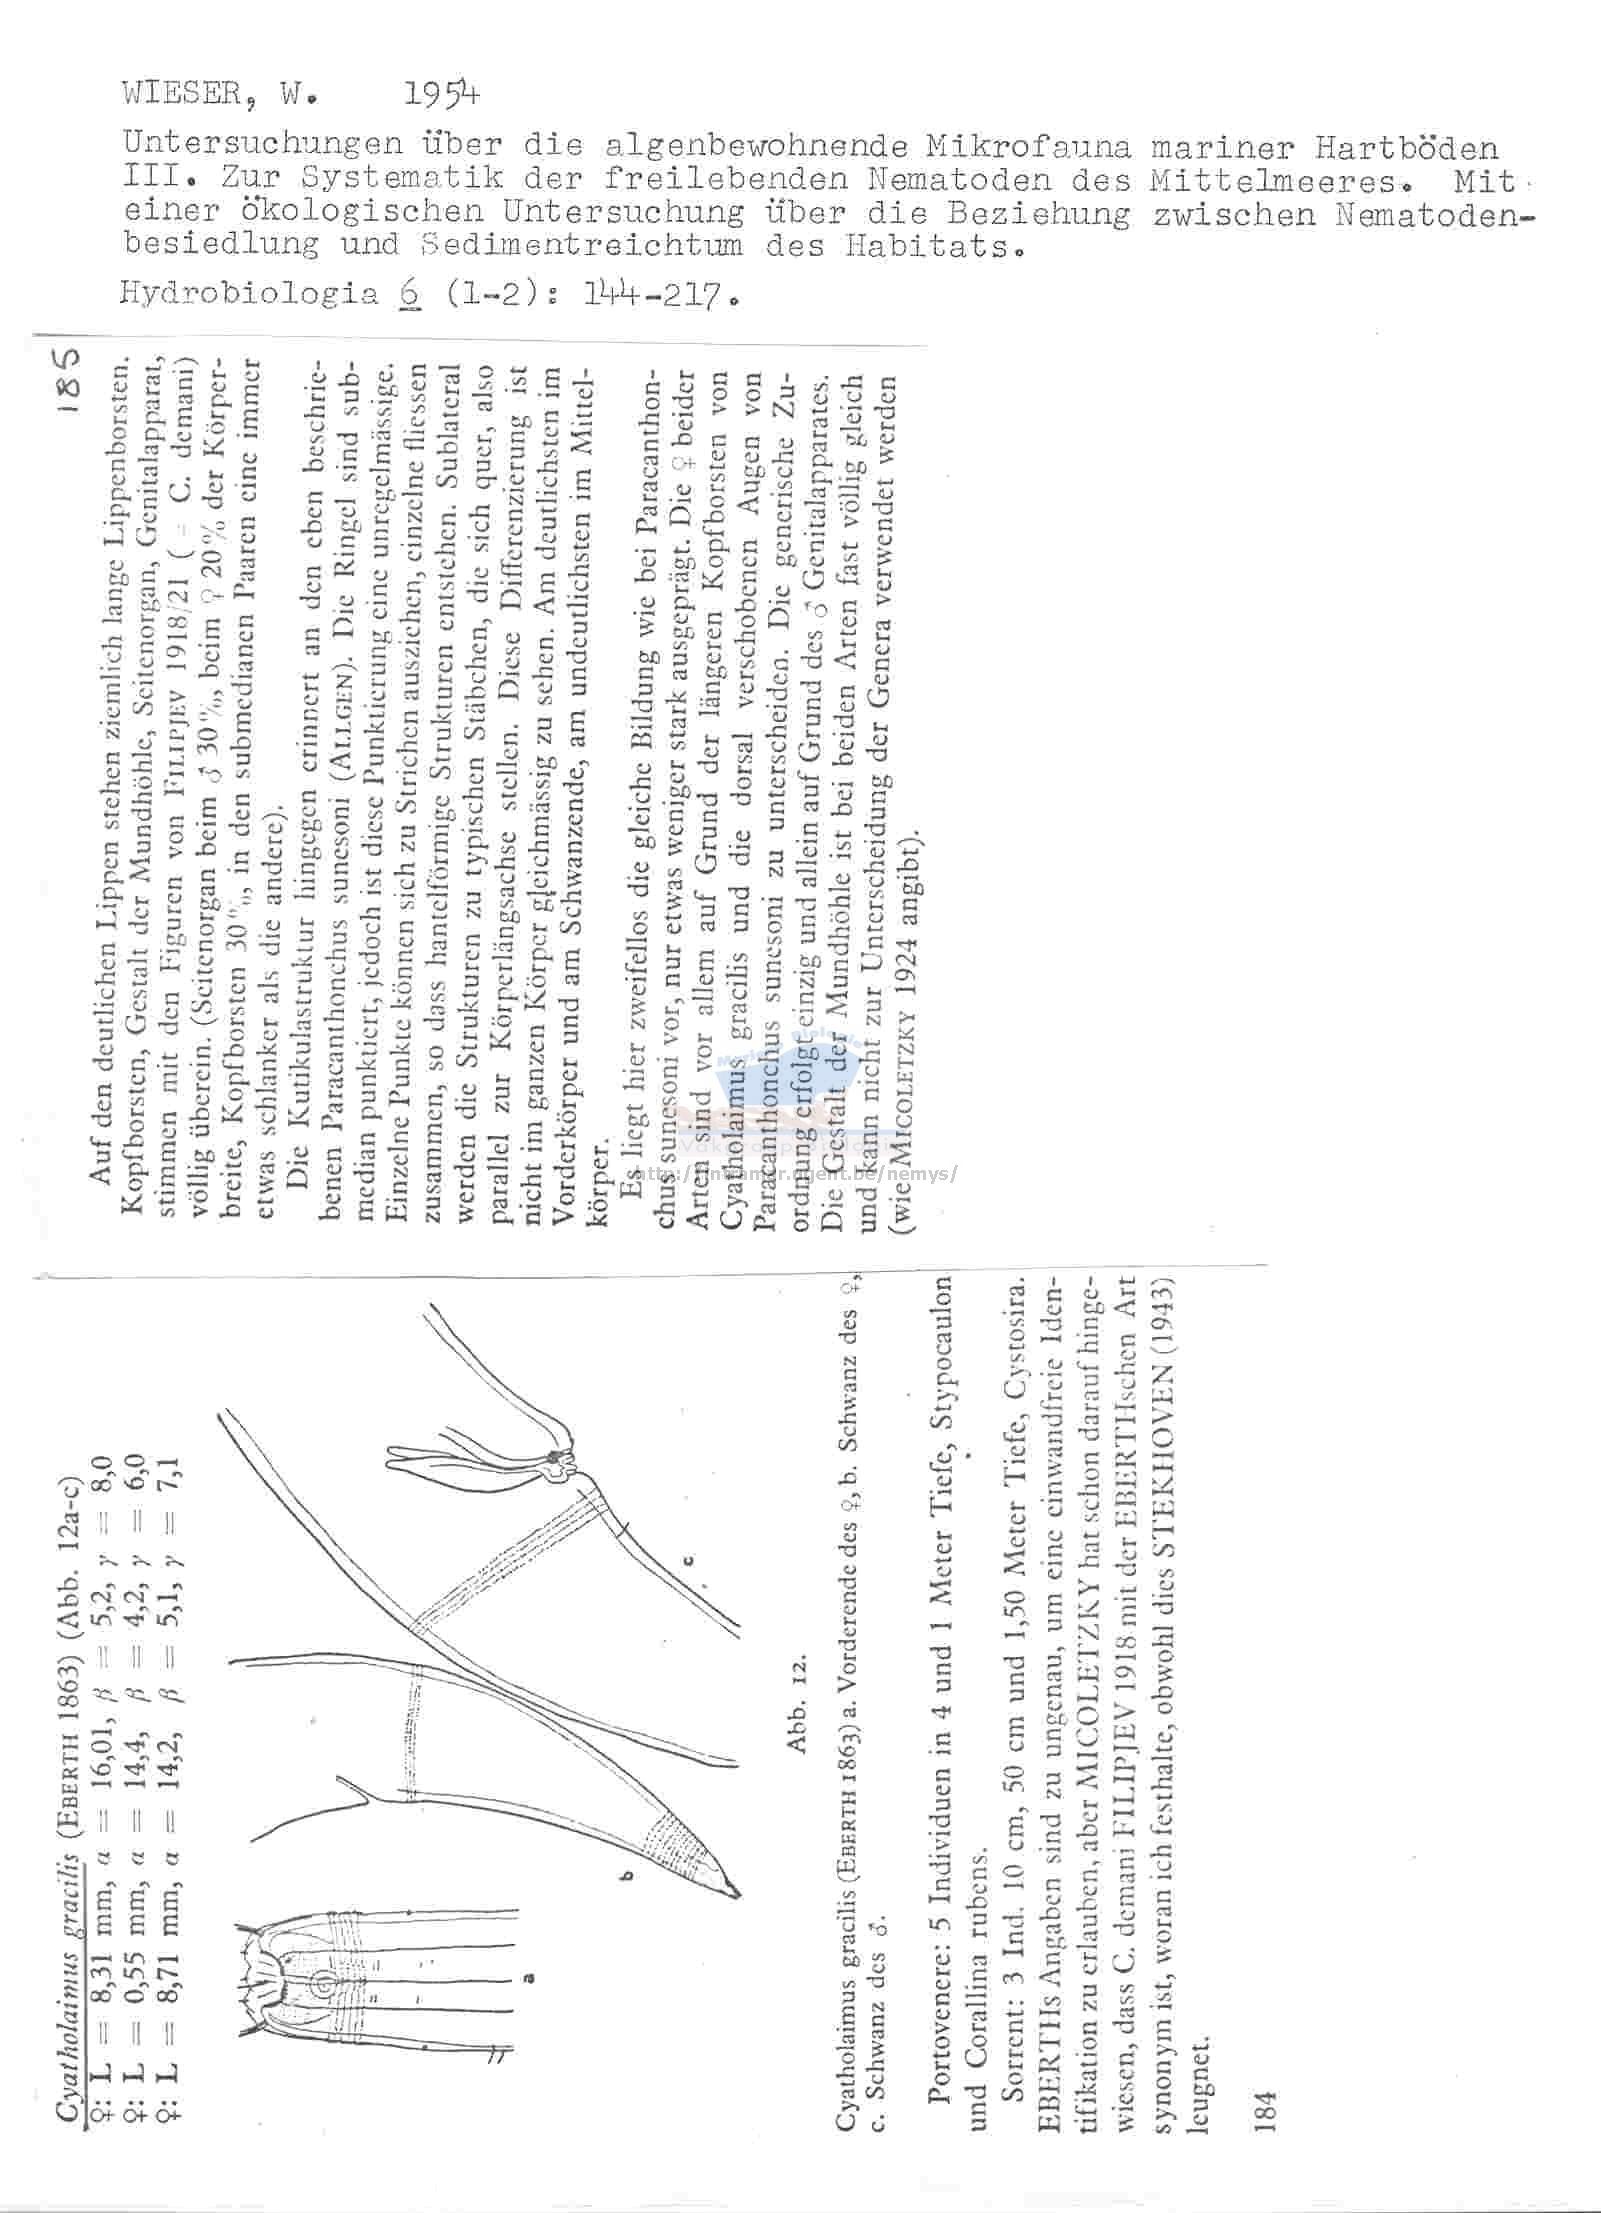 WoRMS - World Register of Marine Species - Photogallery